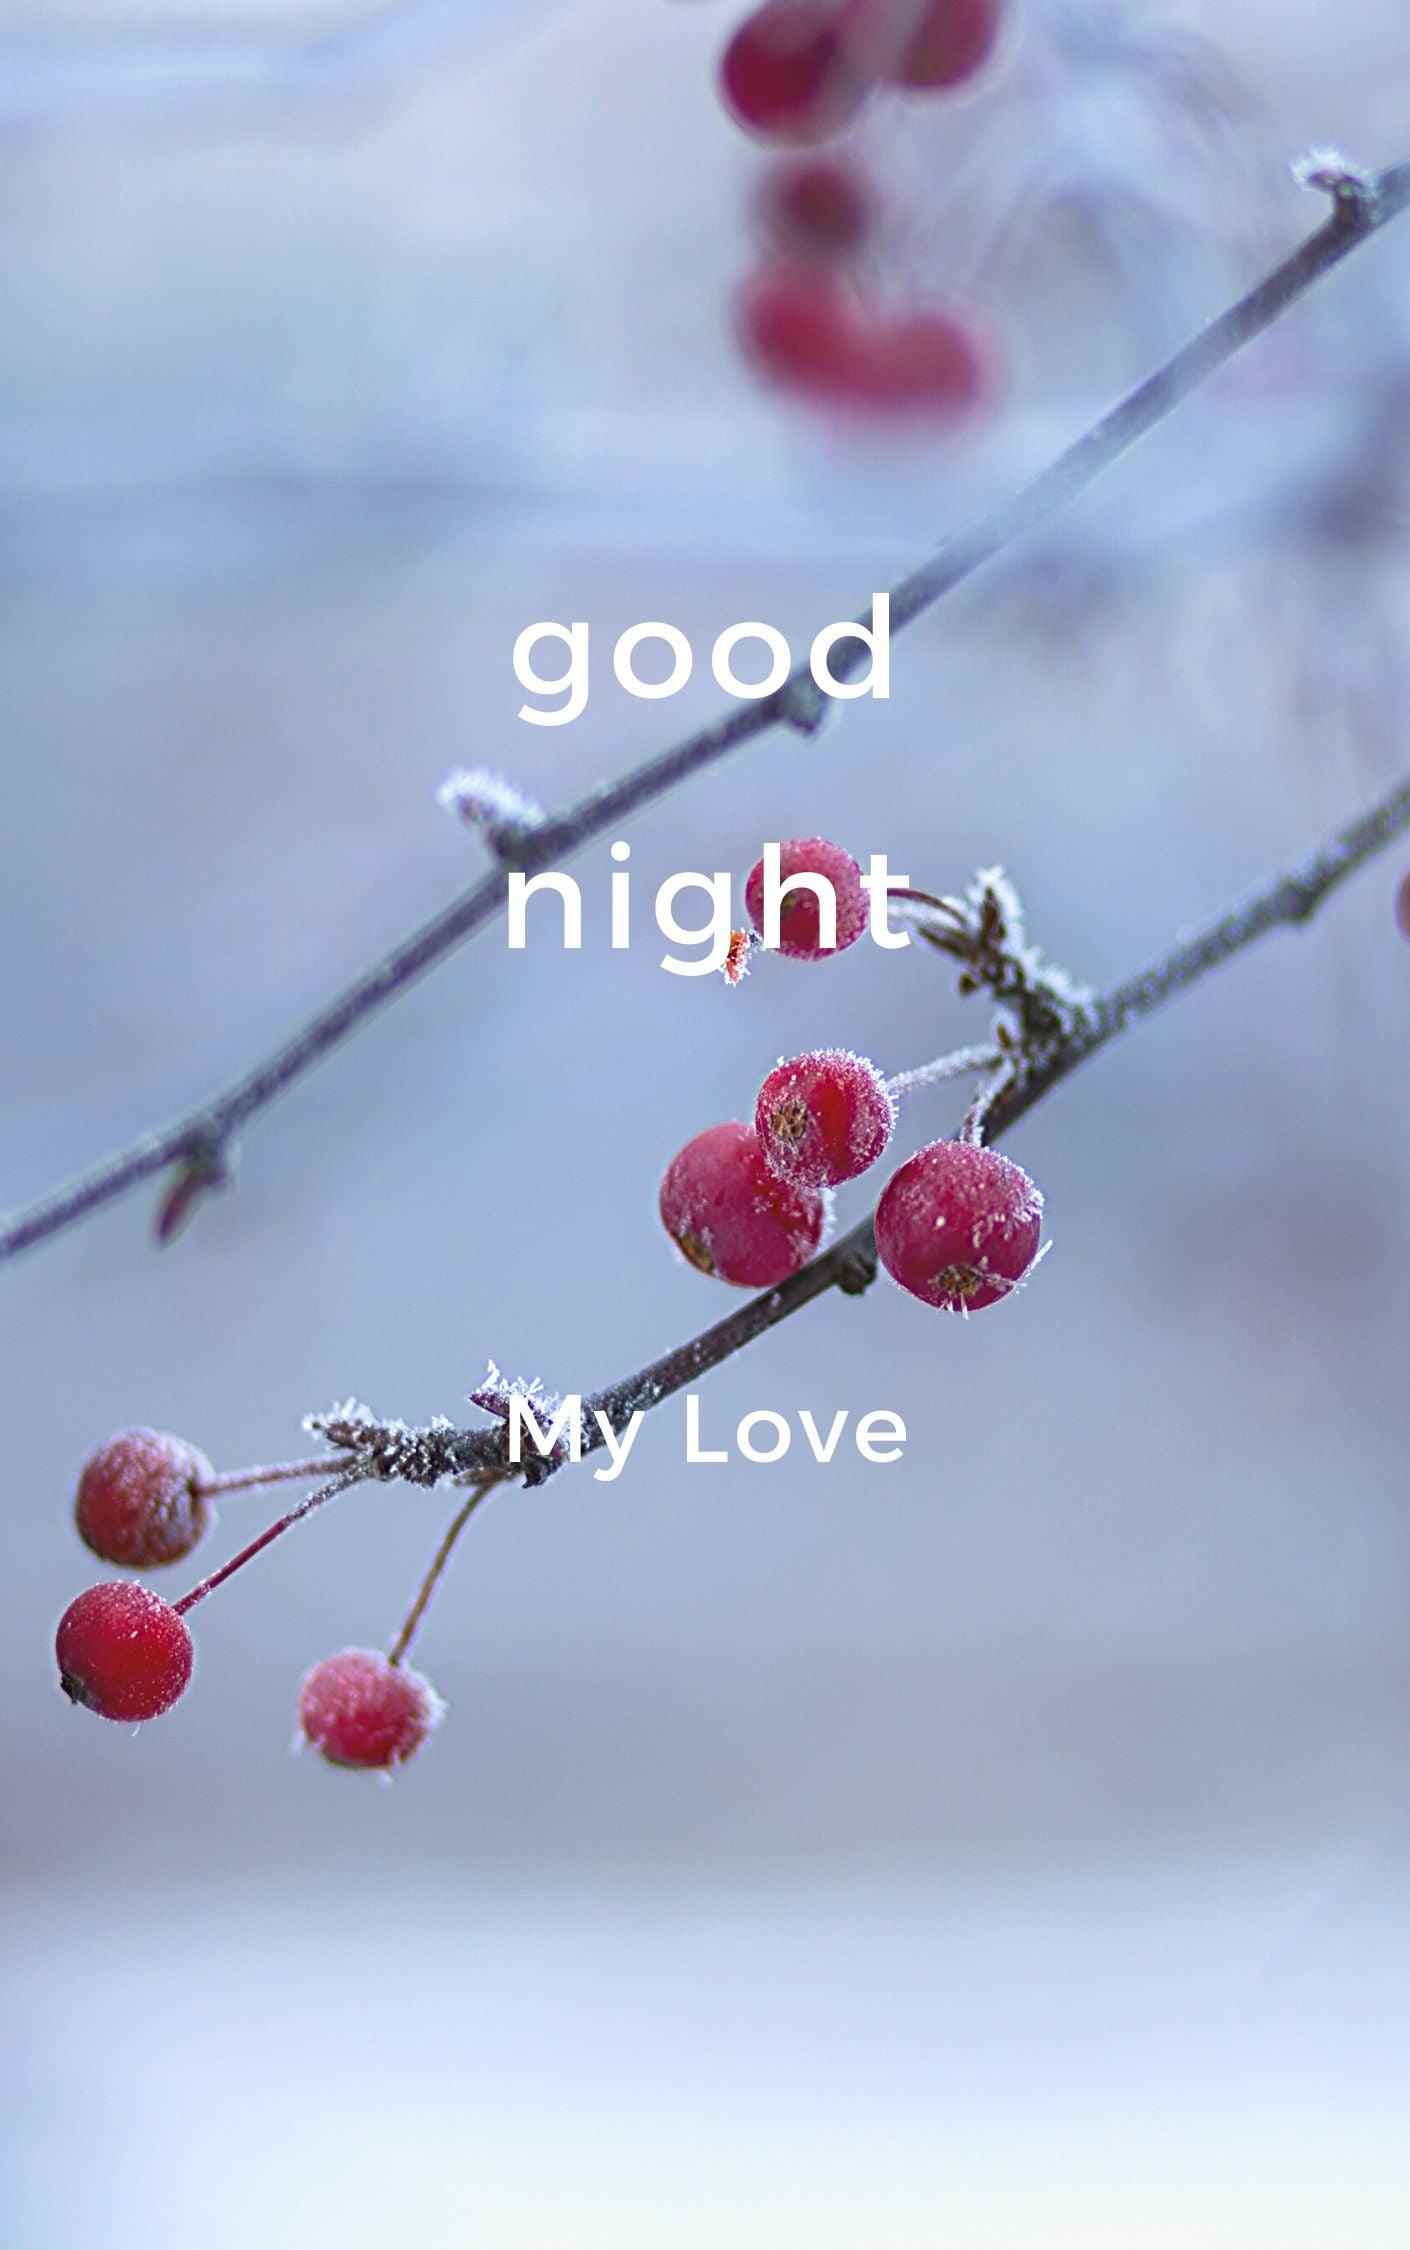 Good Night My Love pic hd full HD free download.